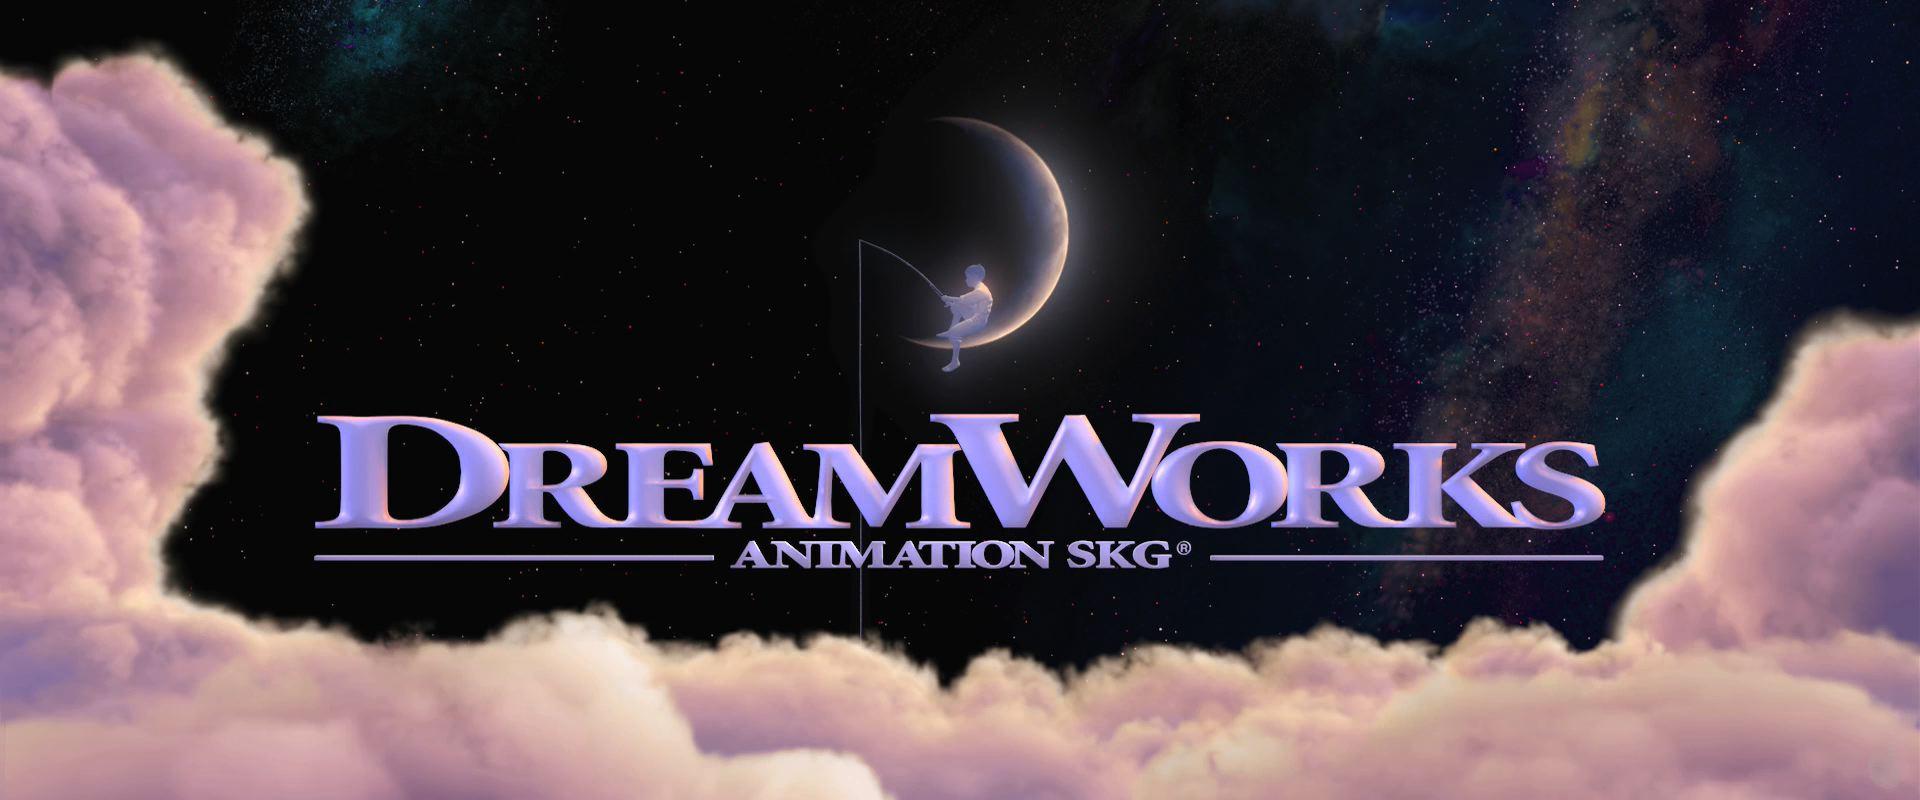 Kyle home dreamworks animation wiki fandom powered by wikia - Dreamworks Studio Space Clouds Logo Wallpaper Jpg